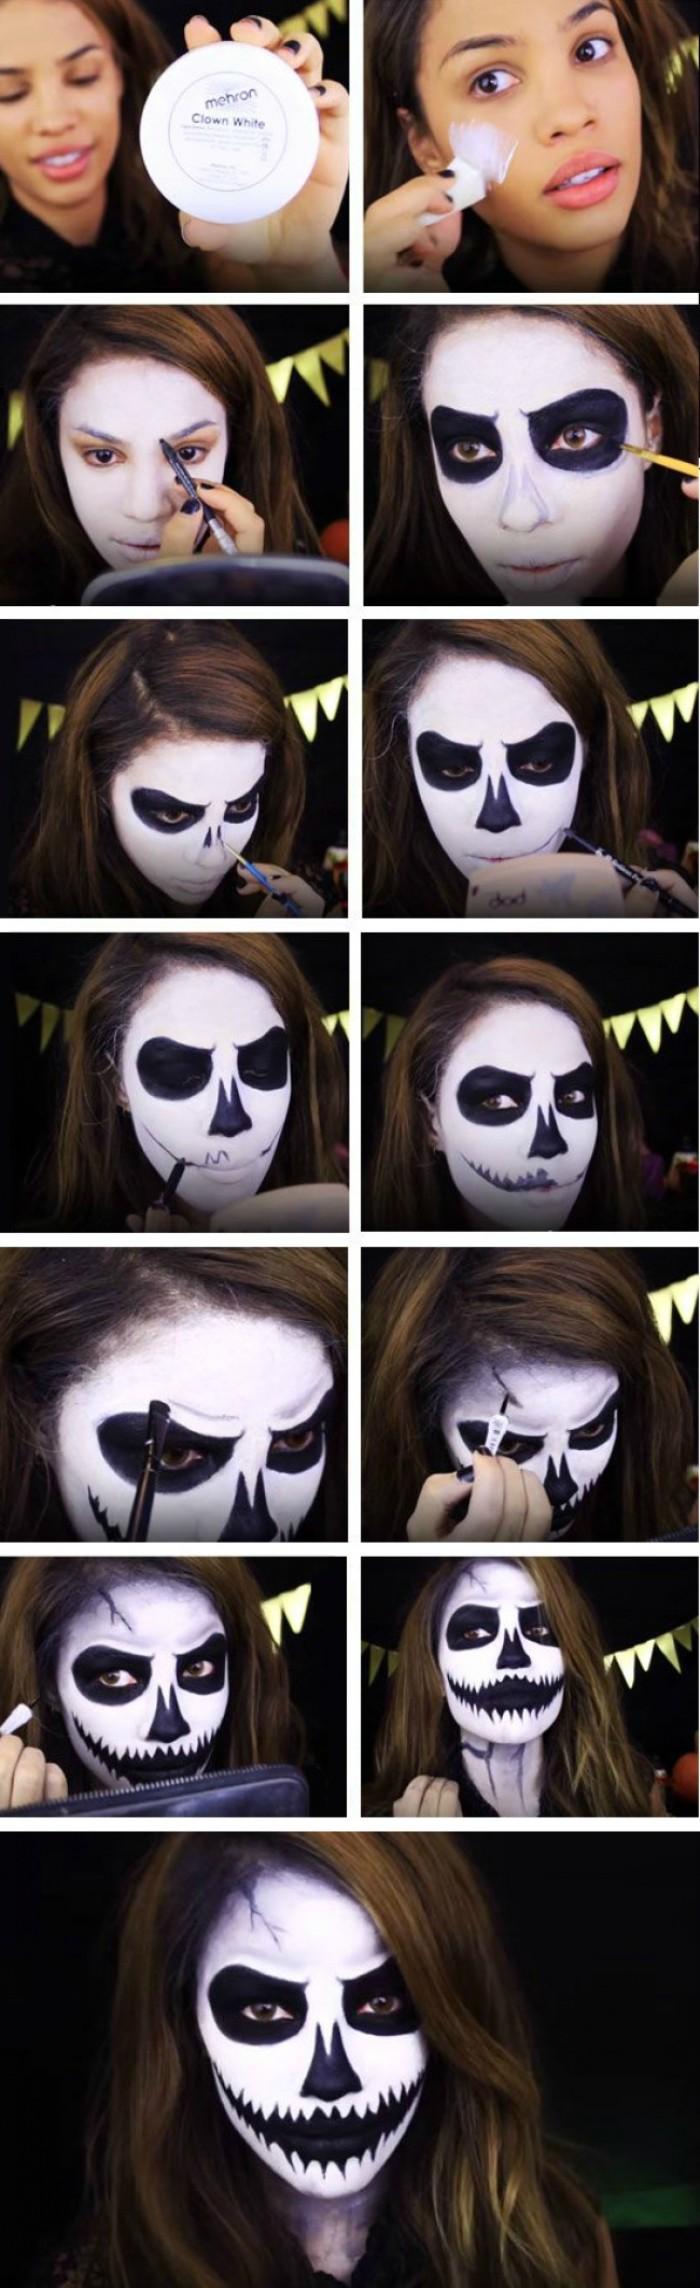 halloween schminideen in bildern anleitung zeigen, sich wie zombie oder mystisches wesen schminken